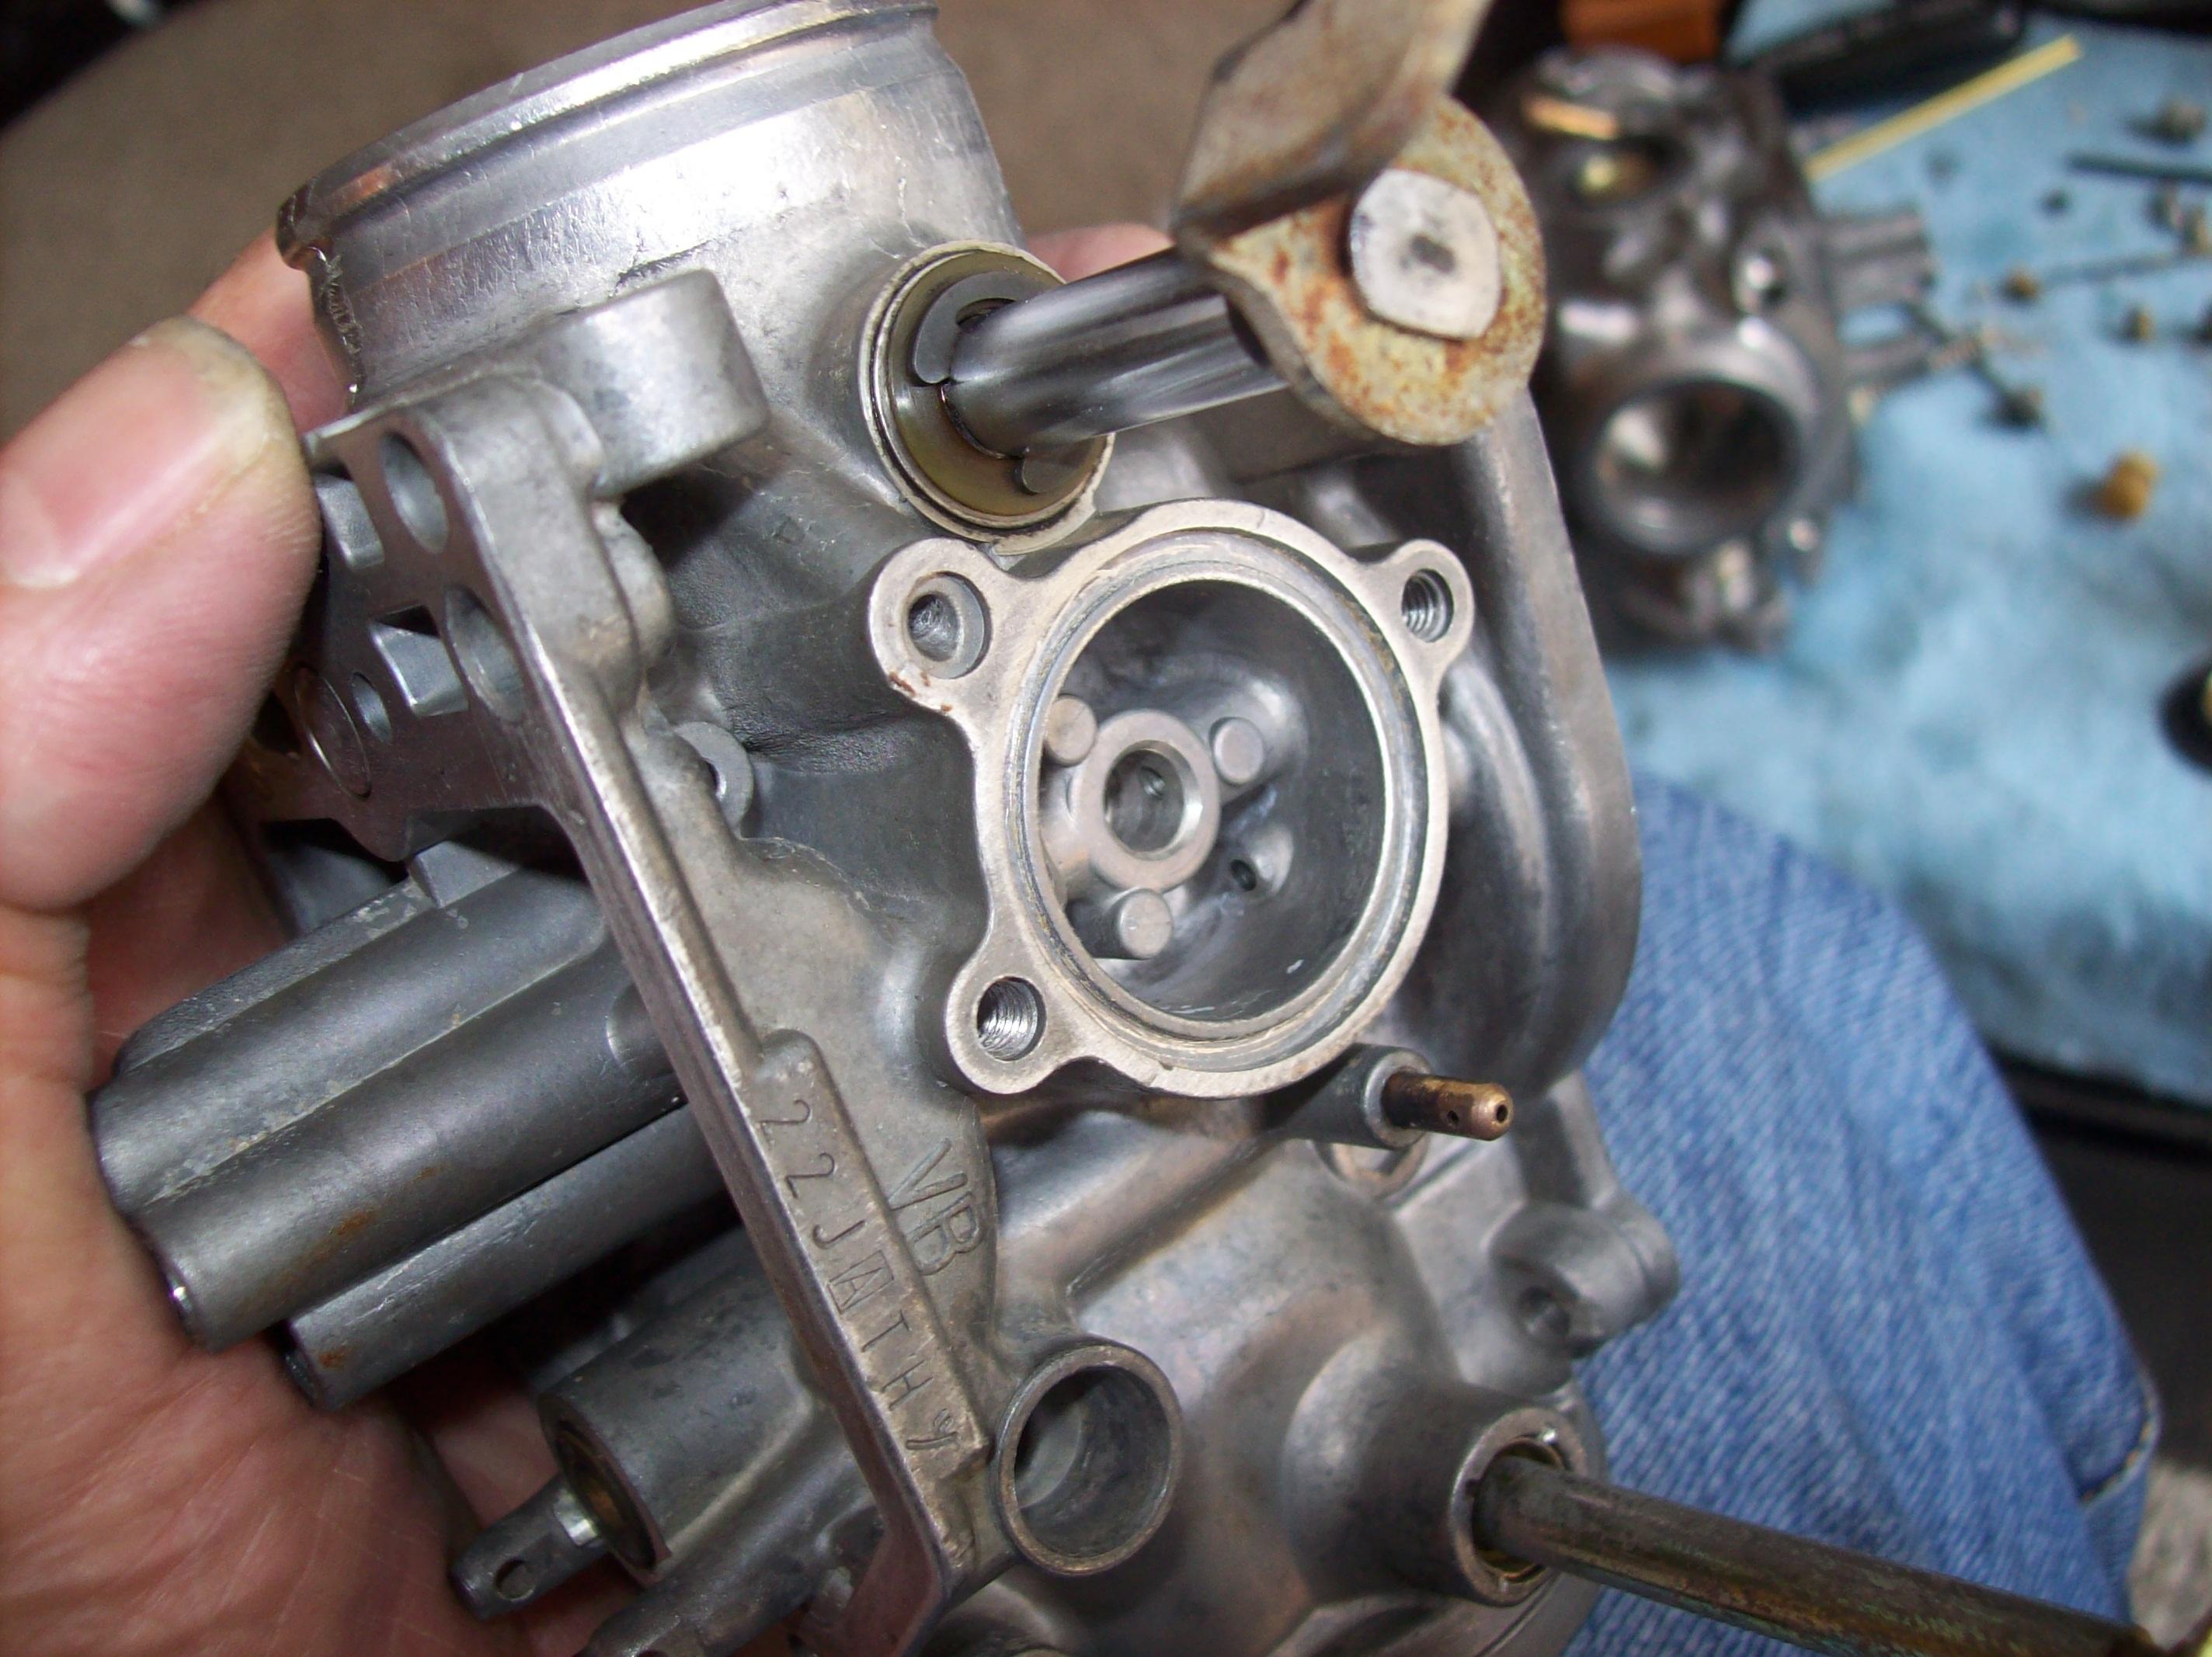 Rebuilding VB Carbs-201_4704.jpg